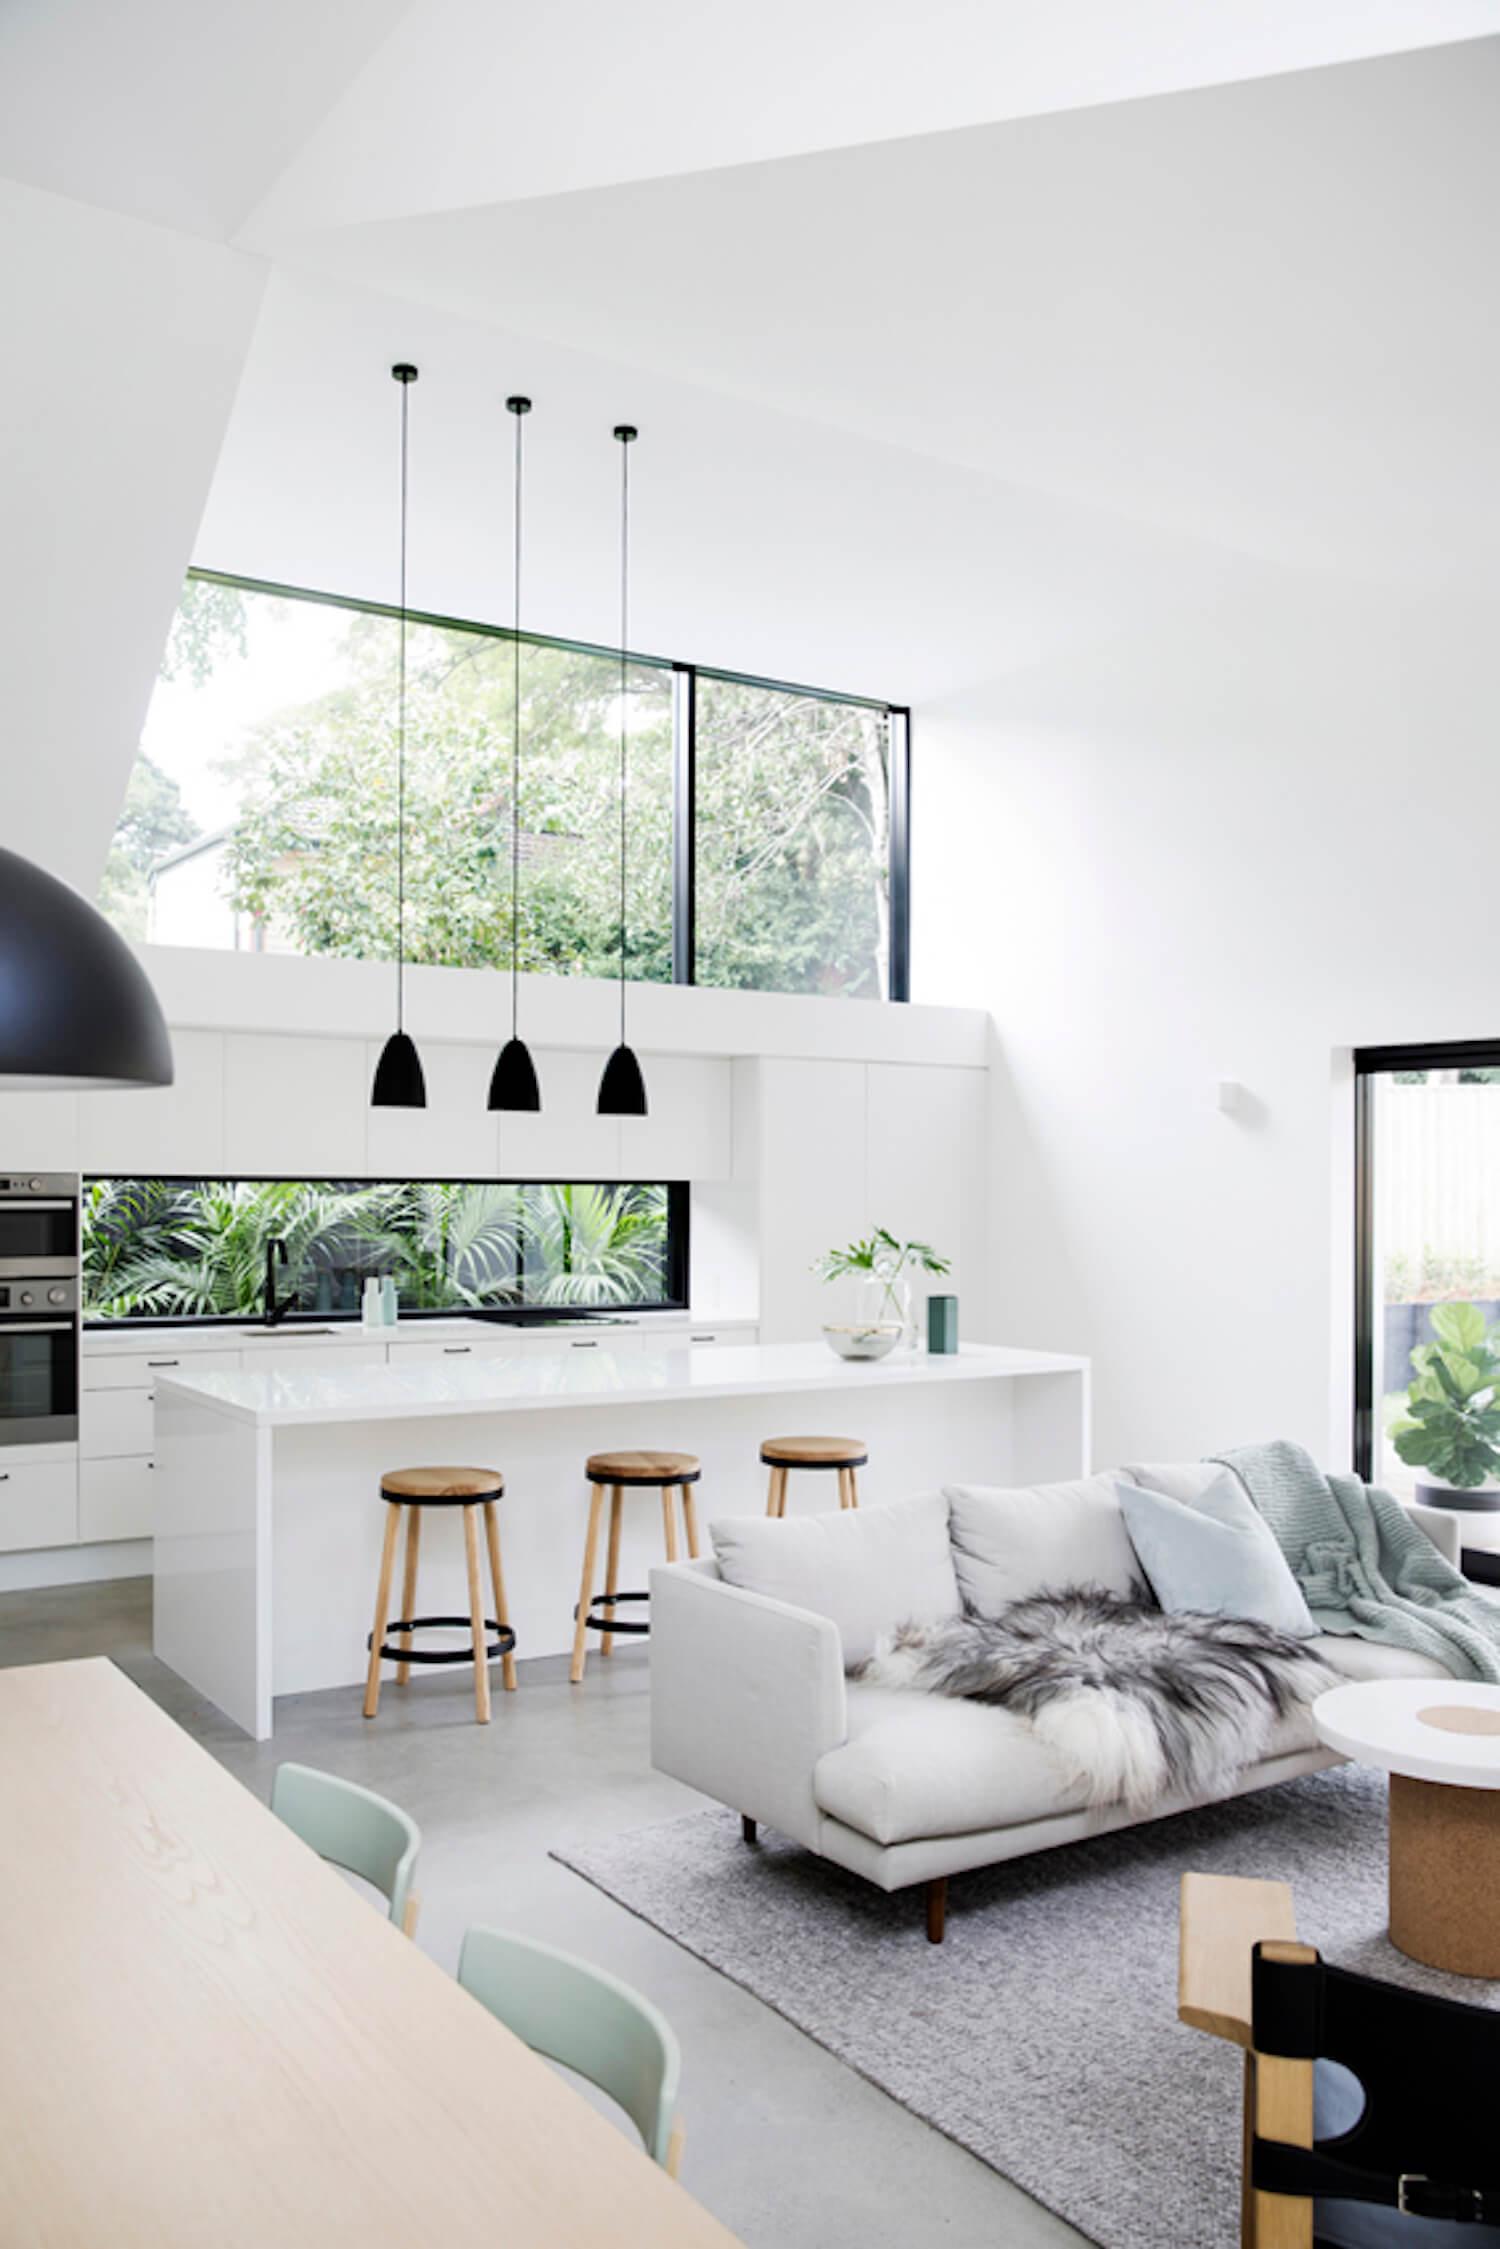 Designed by: Architect Prineas | Photo by: Chris Warnes | Content via:  Est Living